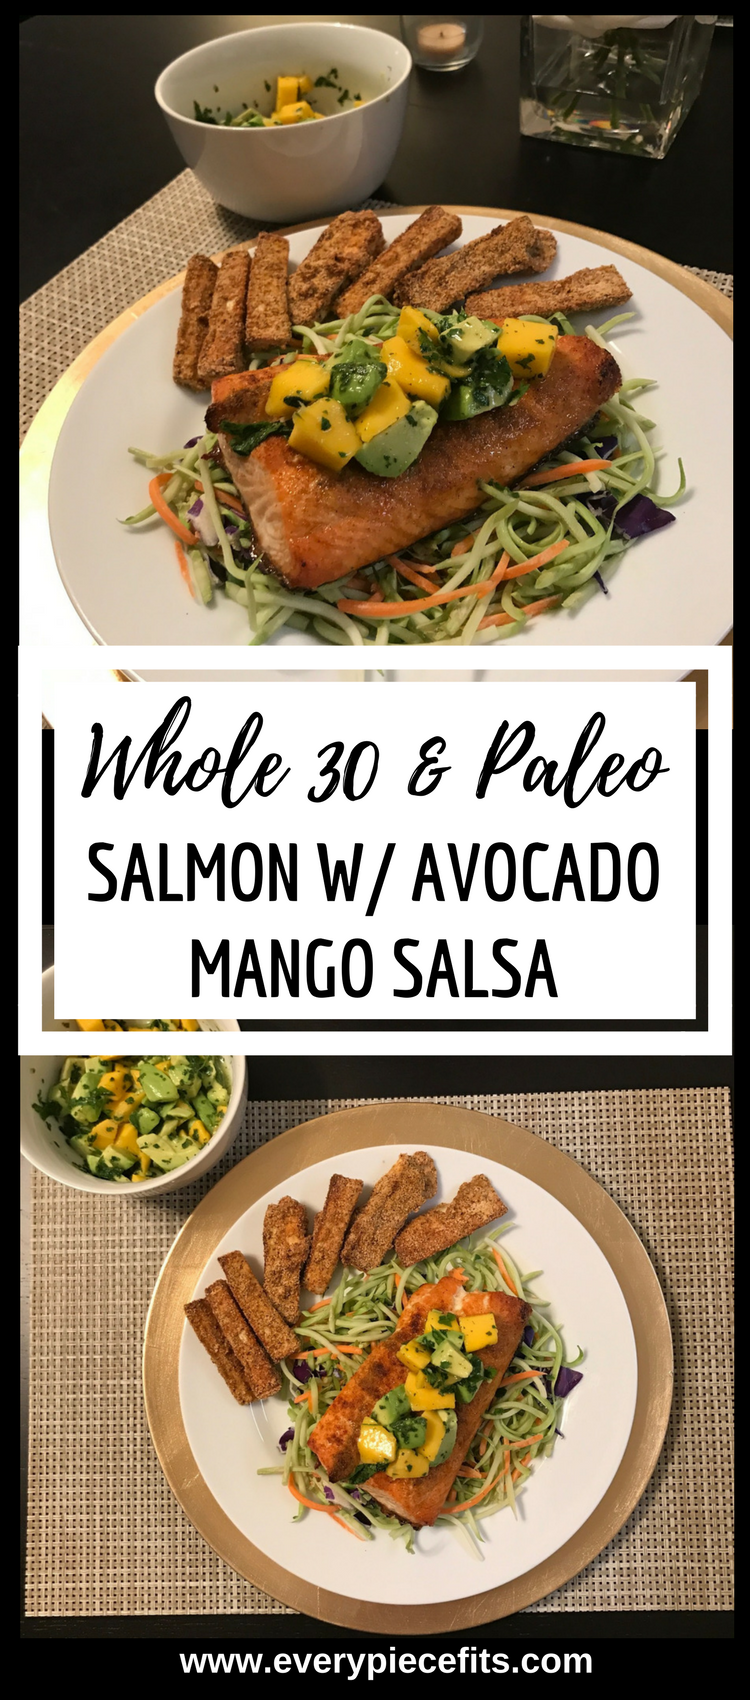 Whole 30 & Paleo Salmon with Avocado Mango Salsa.png